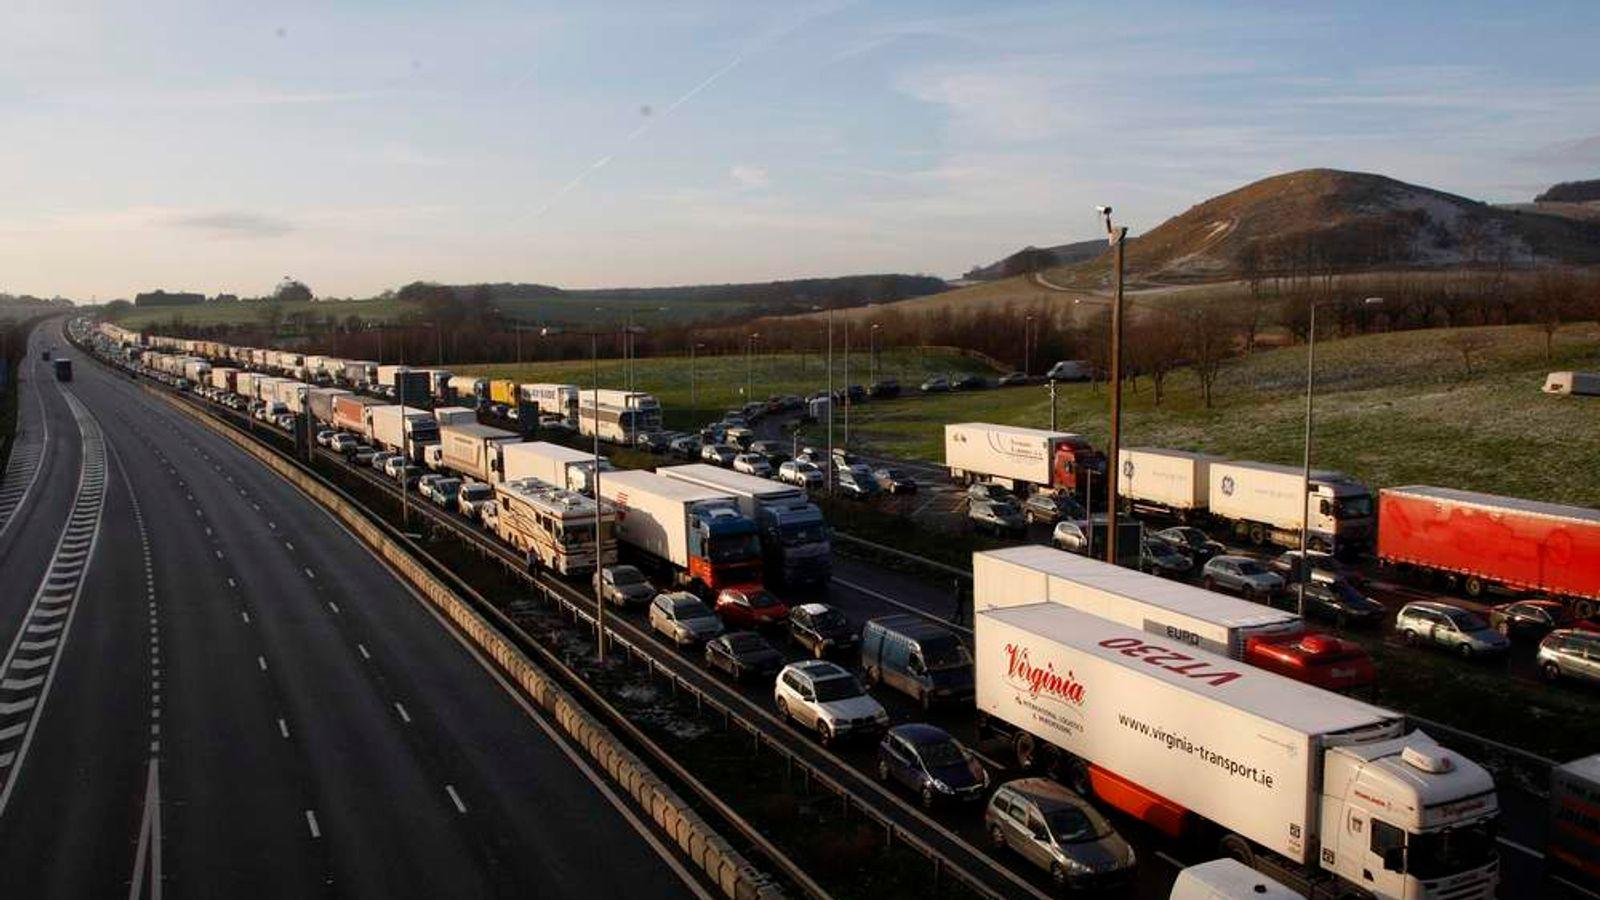 Traffic queues on the M20 motorway